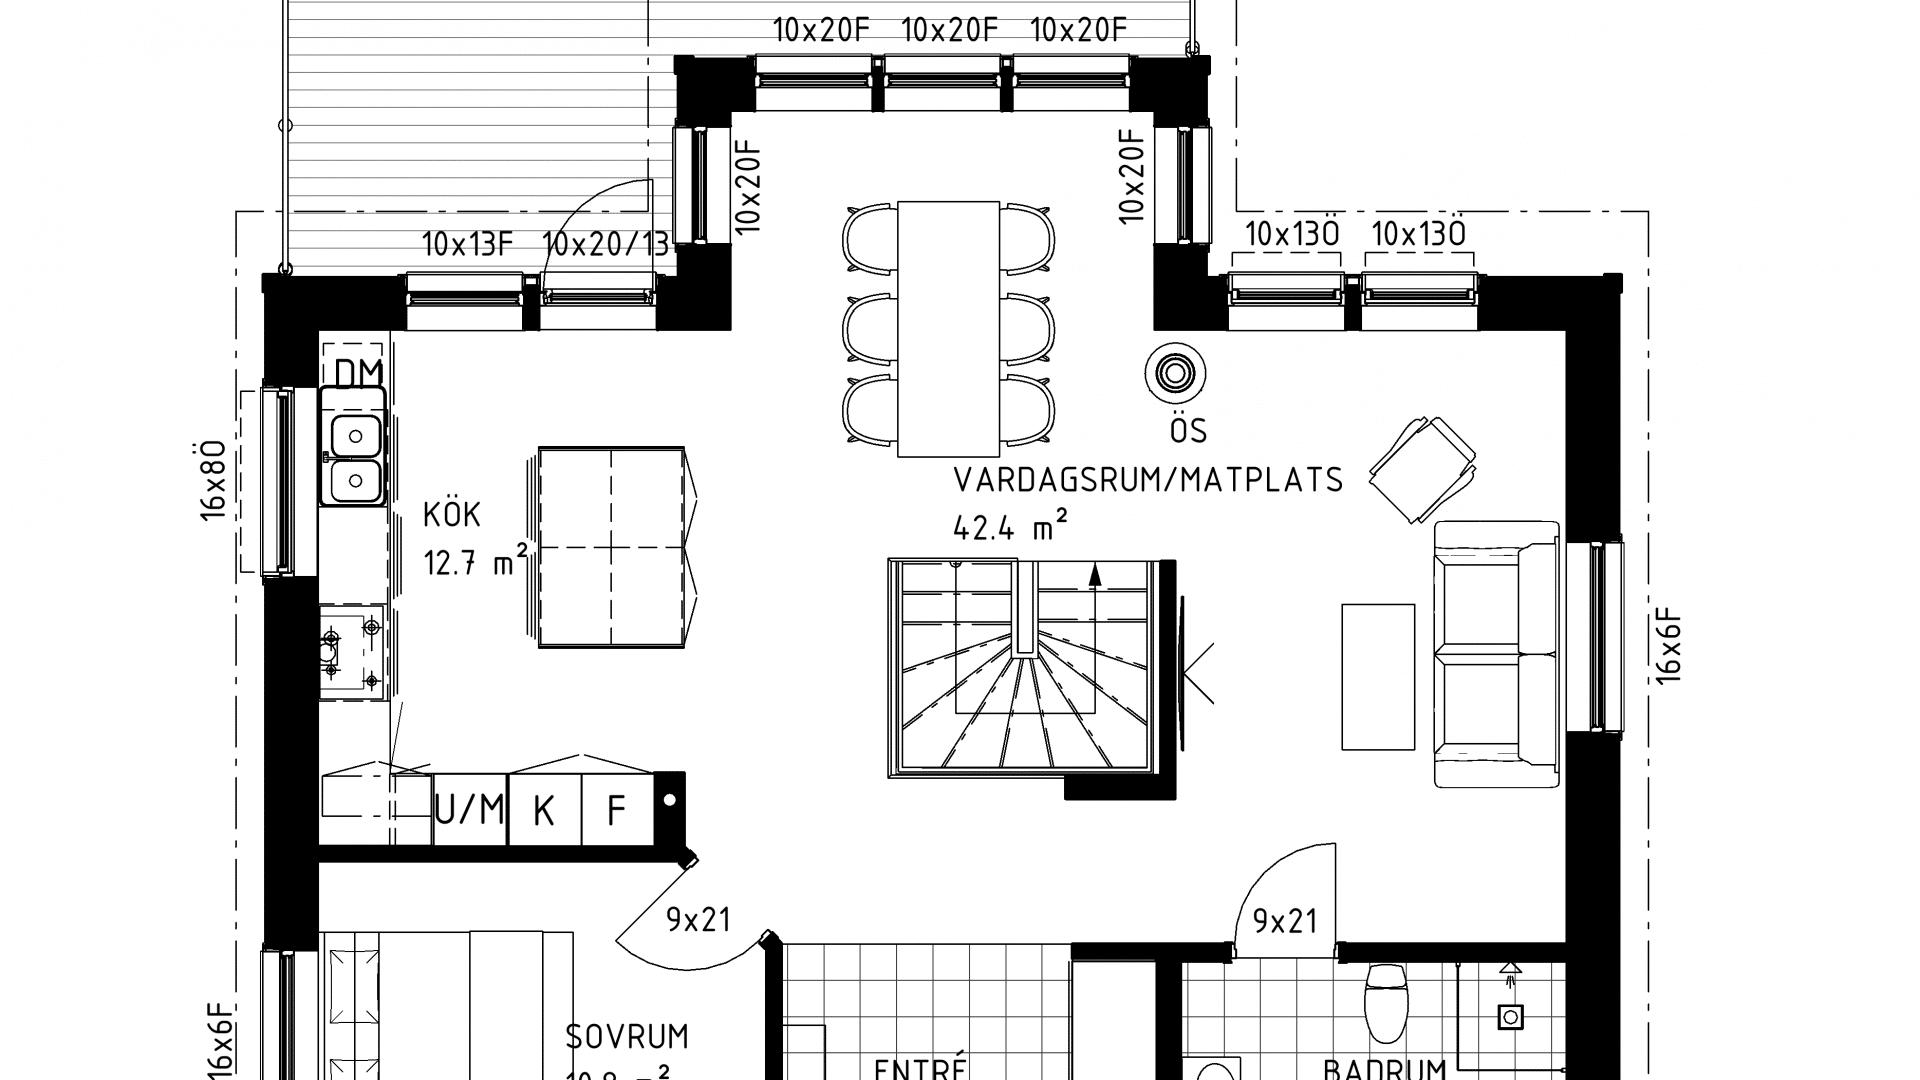 Sundberg_N_Plan 2